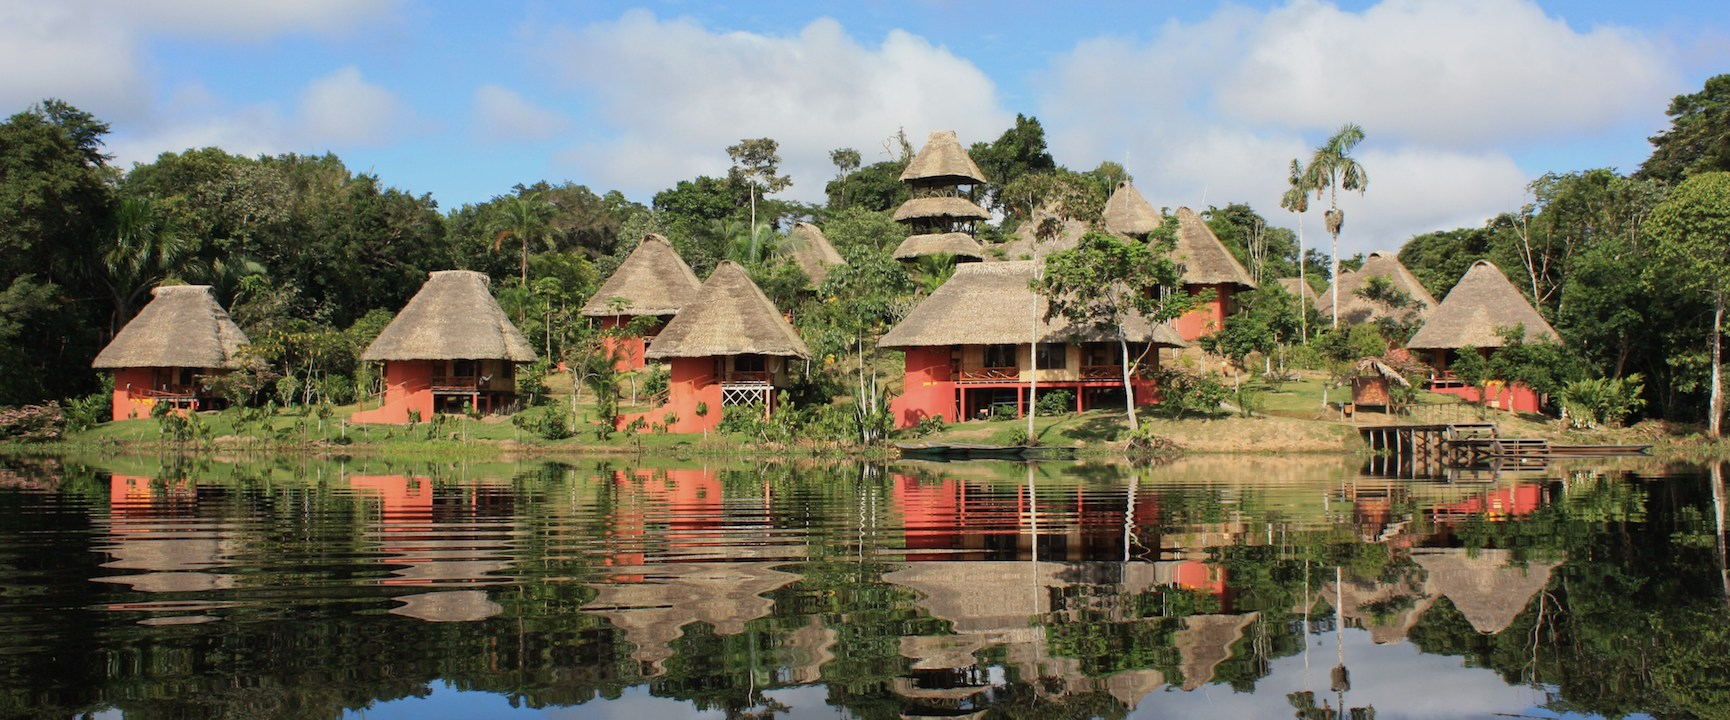 4D-3N Amazon Rainforest amazing Wildlife experience / Plane , Boat , Hike / Premium tour